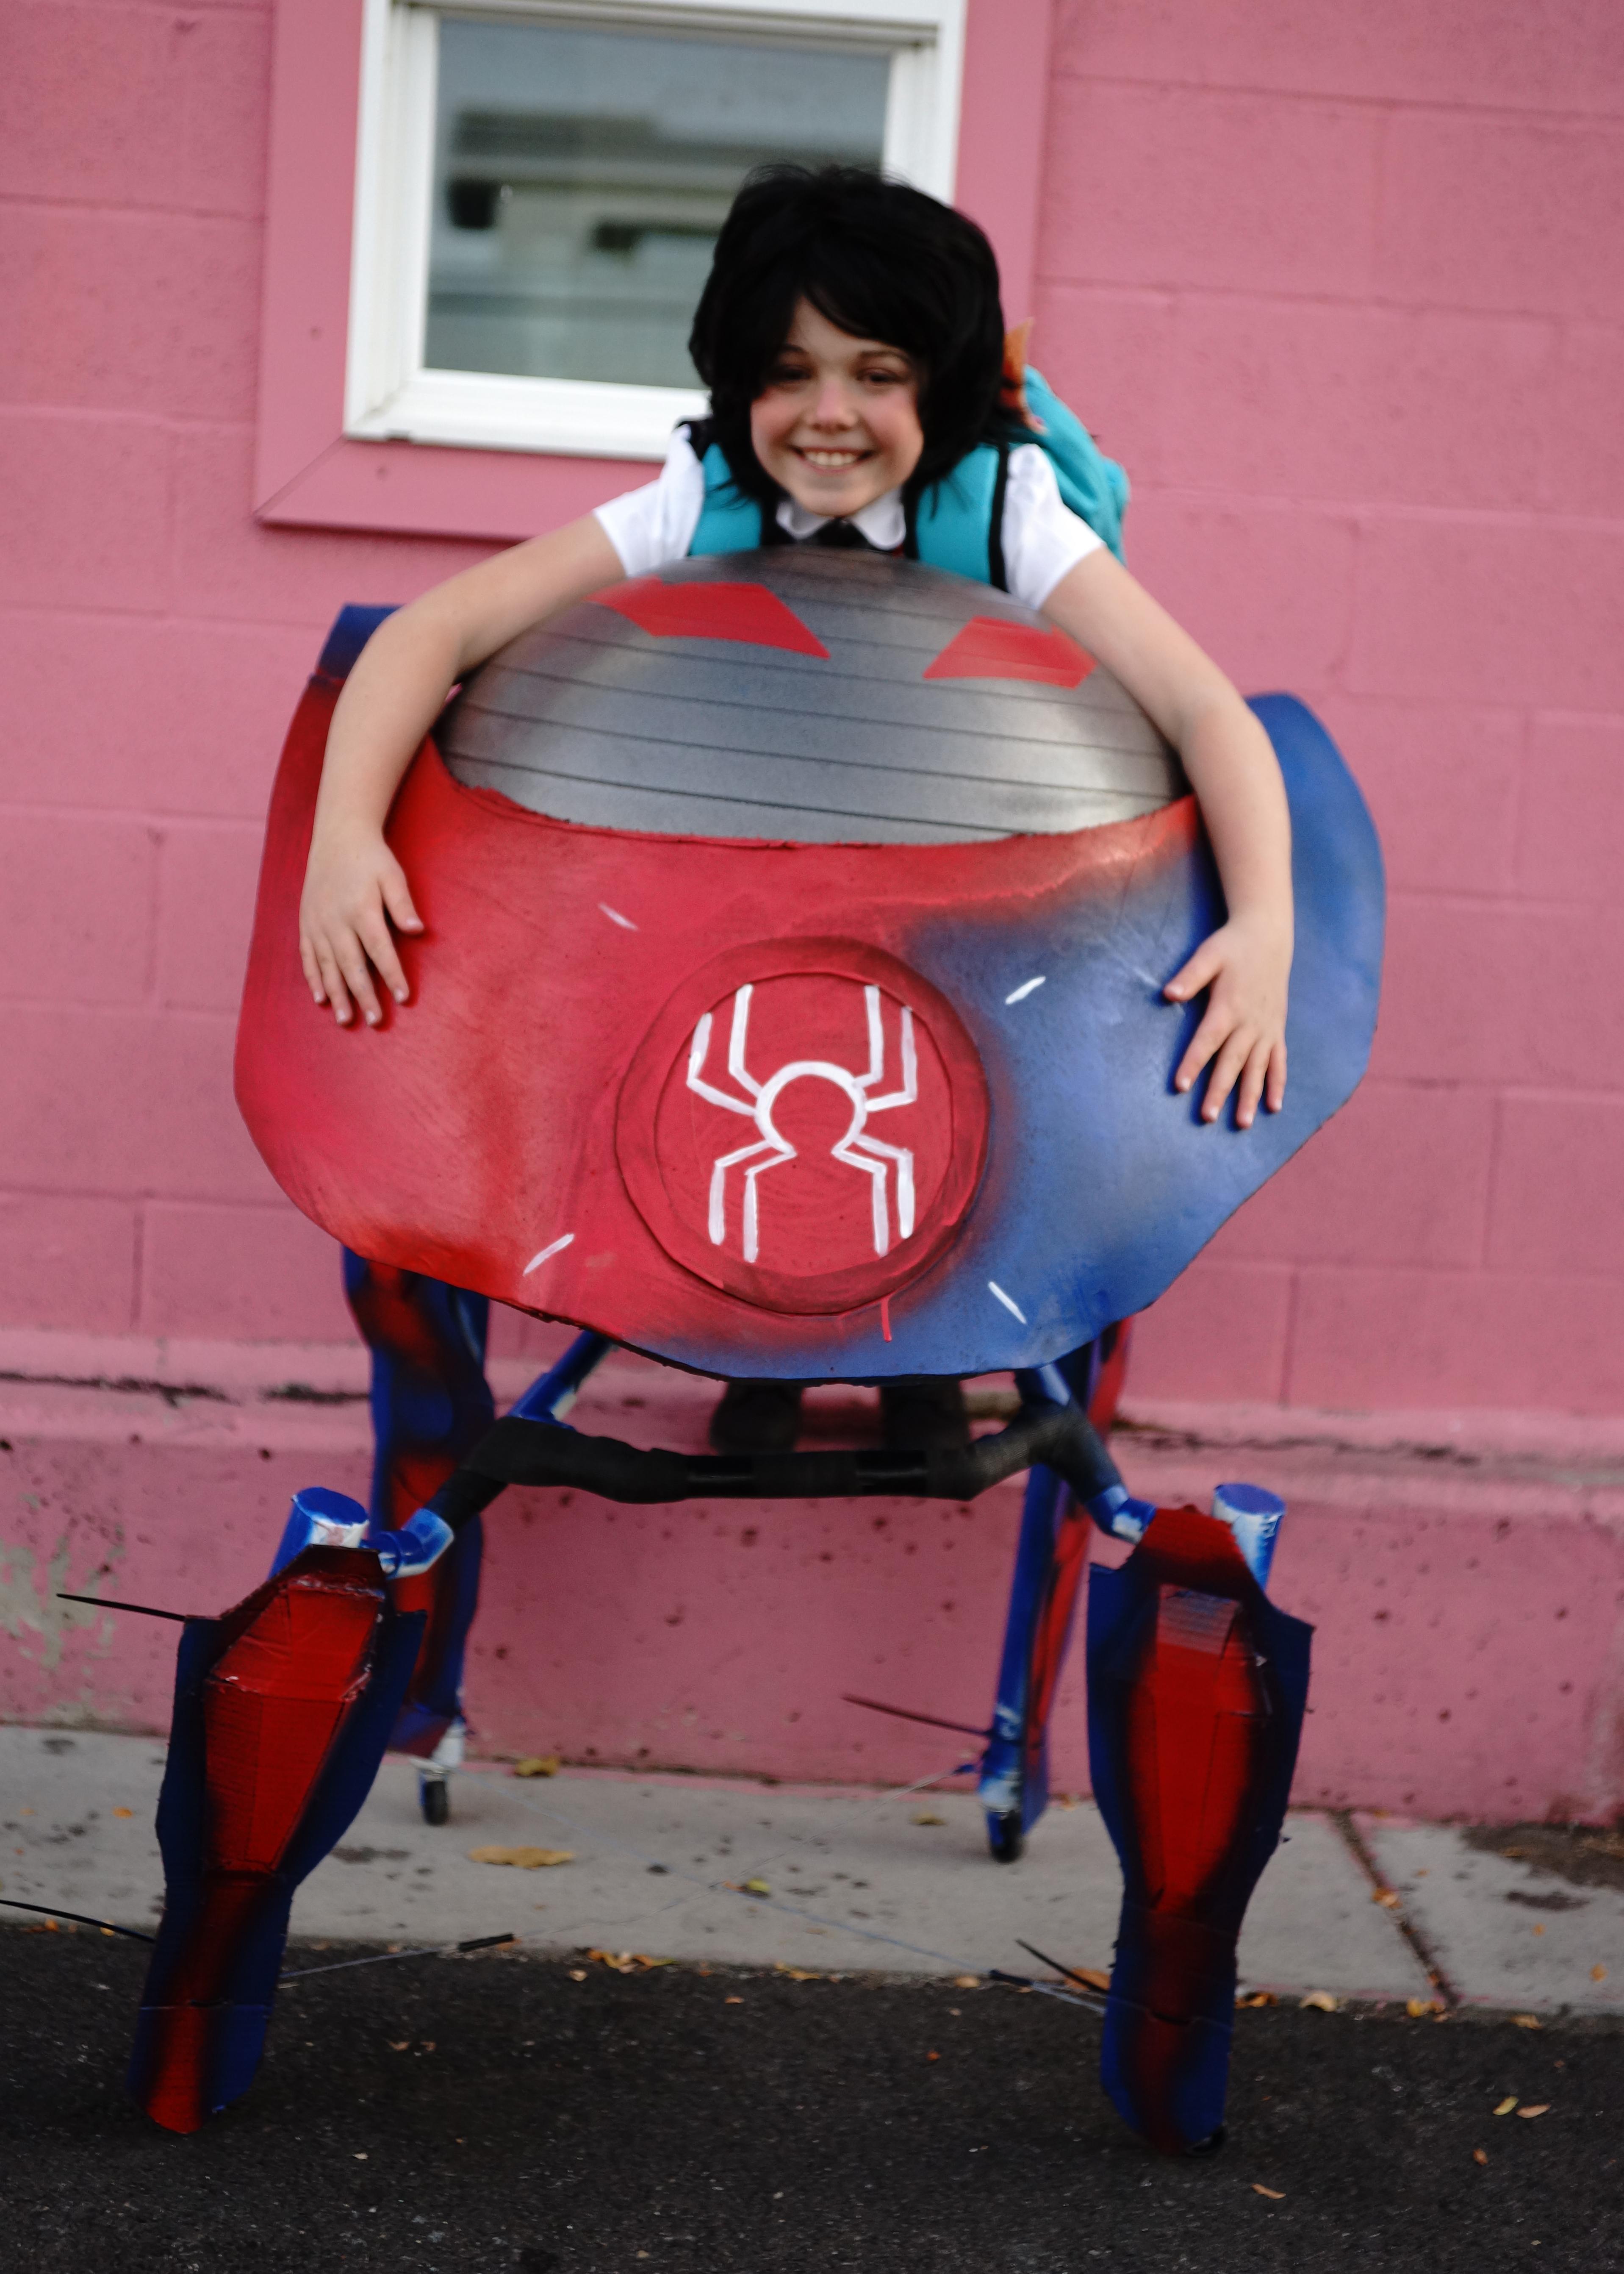 Clara_Spiderbot_hug